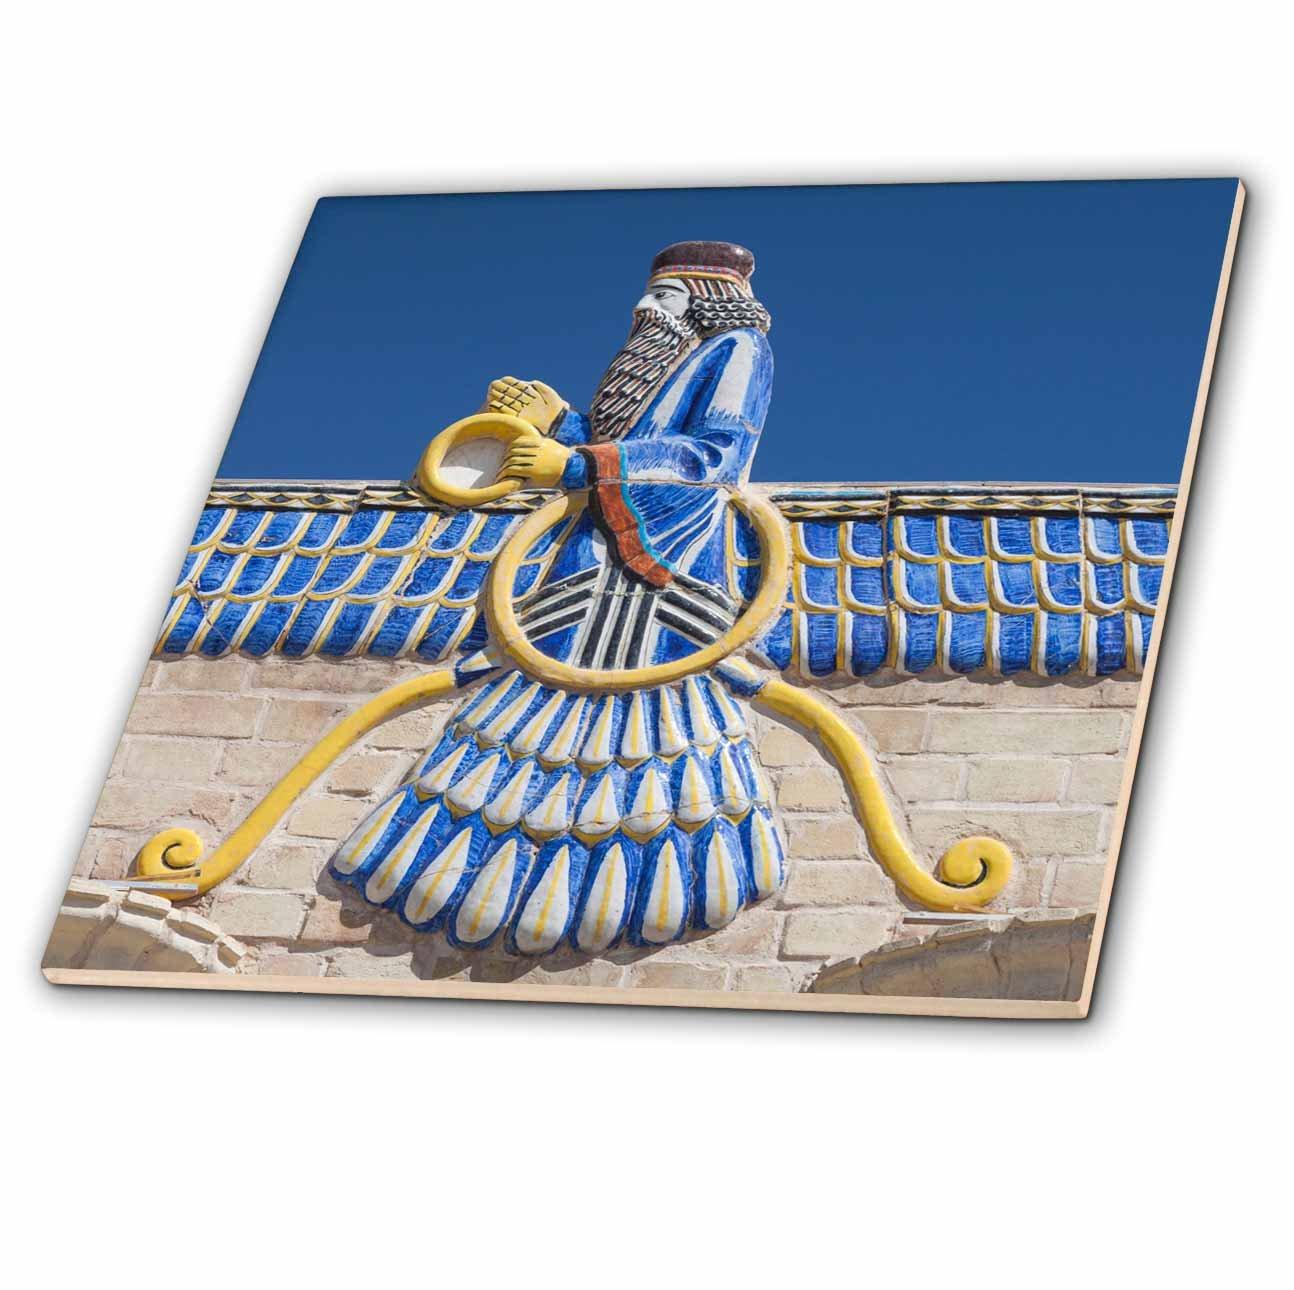 3dRose Danita Delimont - Artwork - Central Iran, Yazd, Ateshkadeh, Zoroastrian Fire Temple, Exterior - 8 Inch Glass Tile (ct_276824_7)